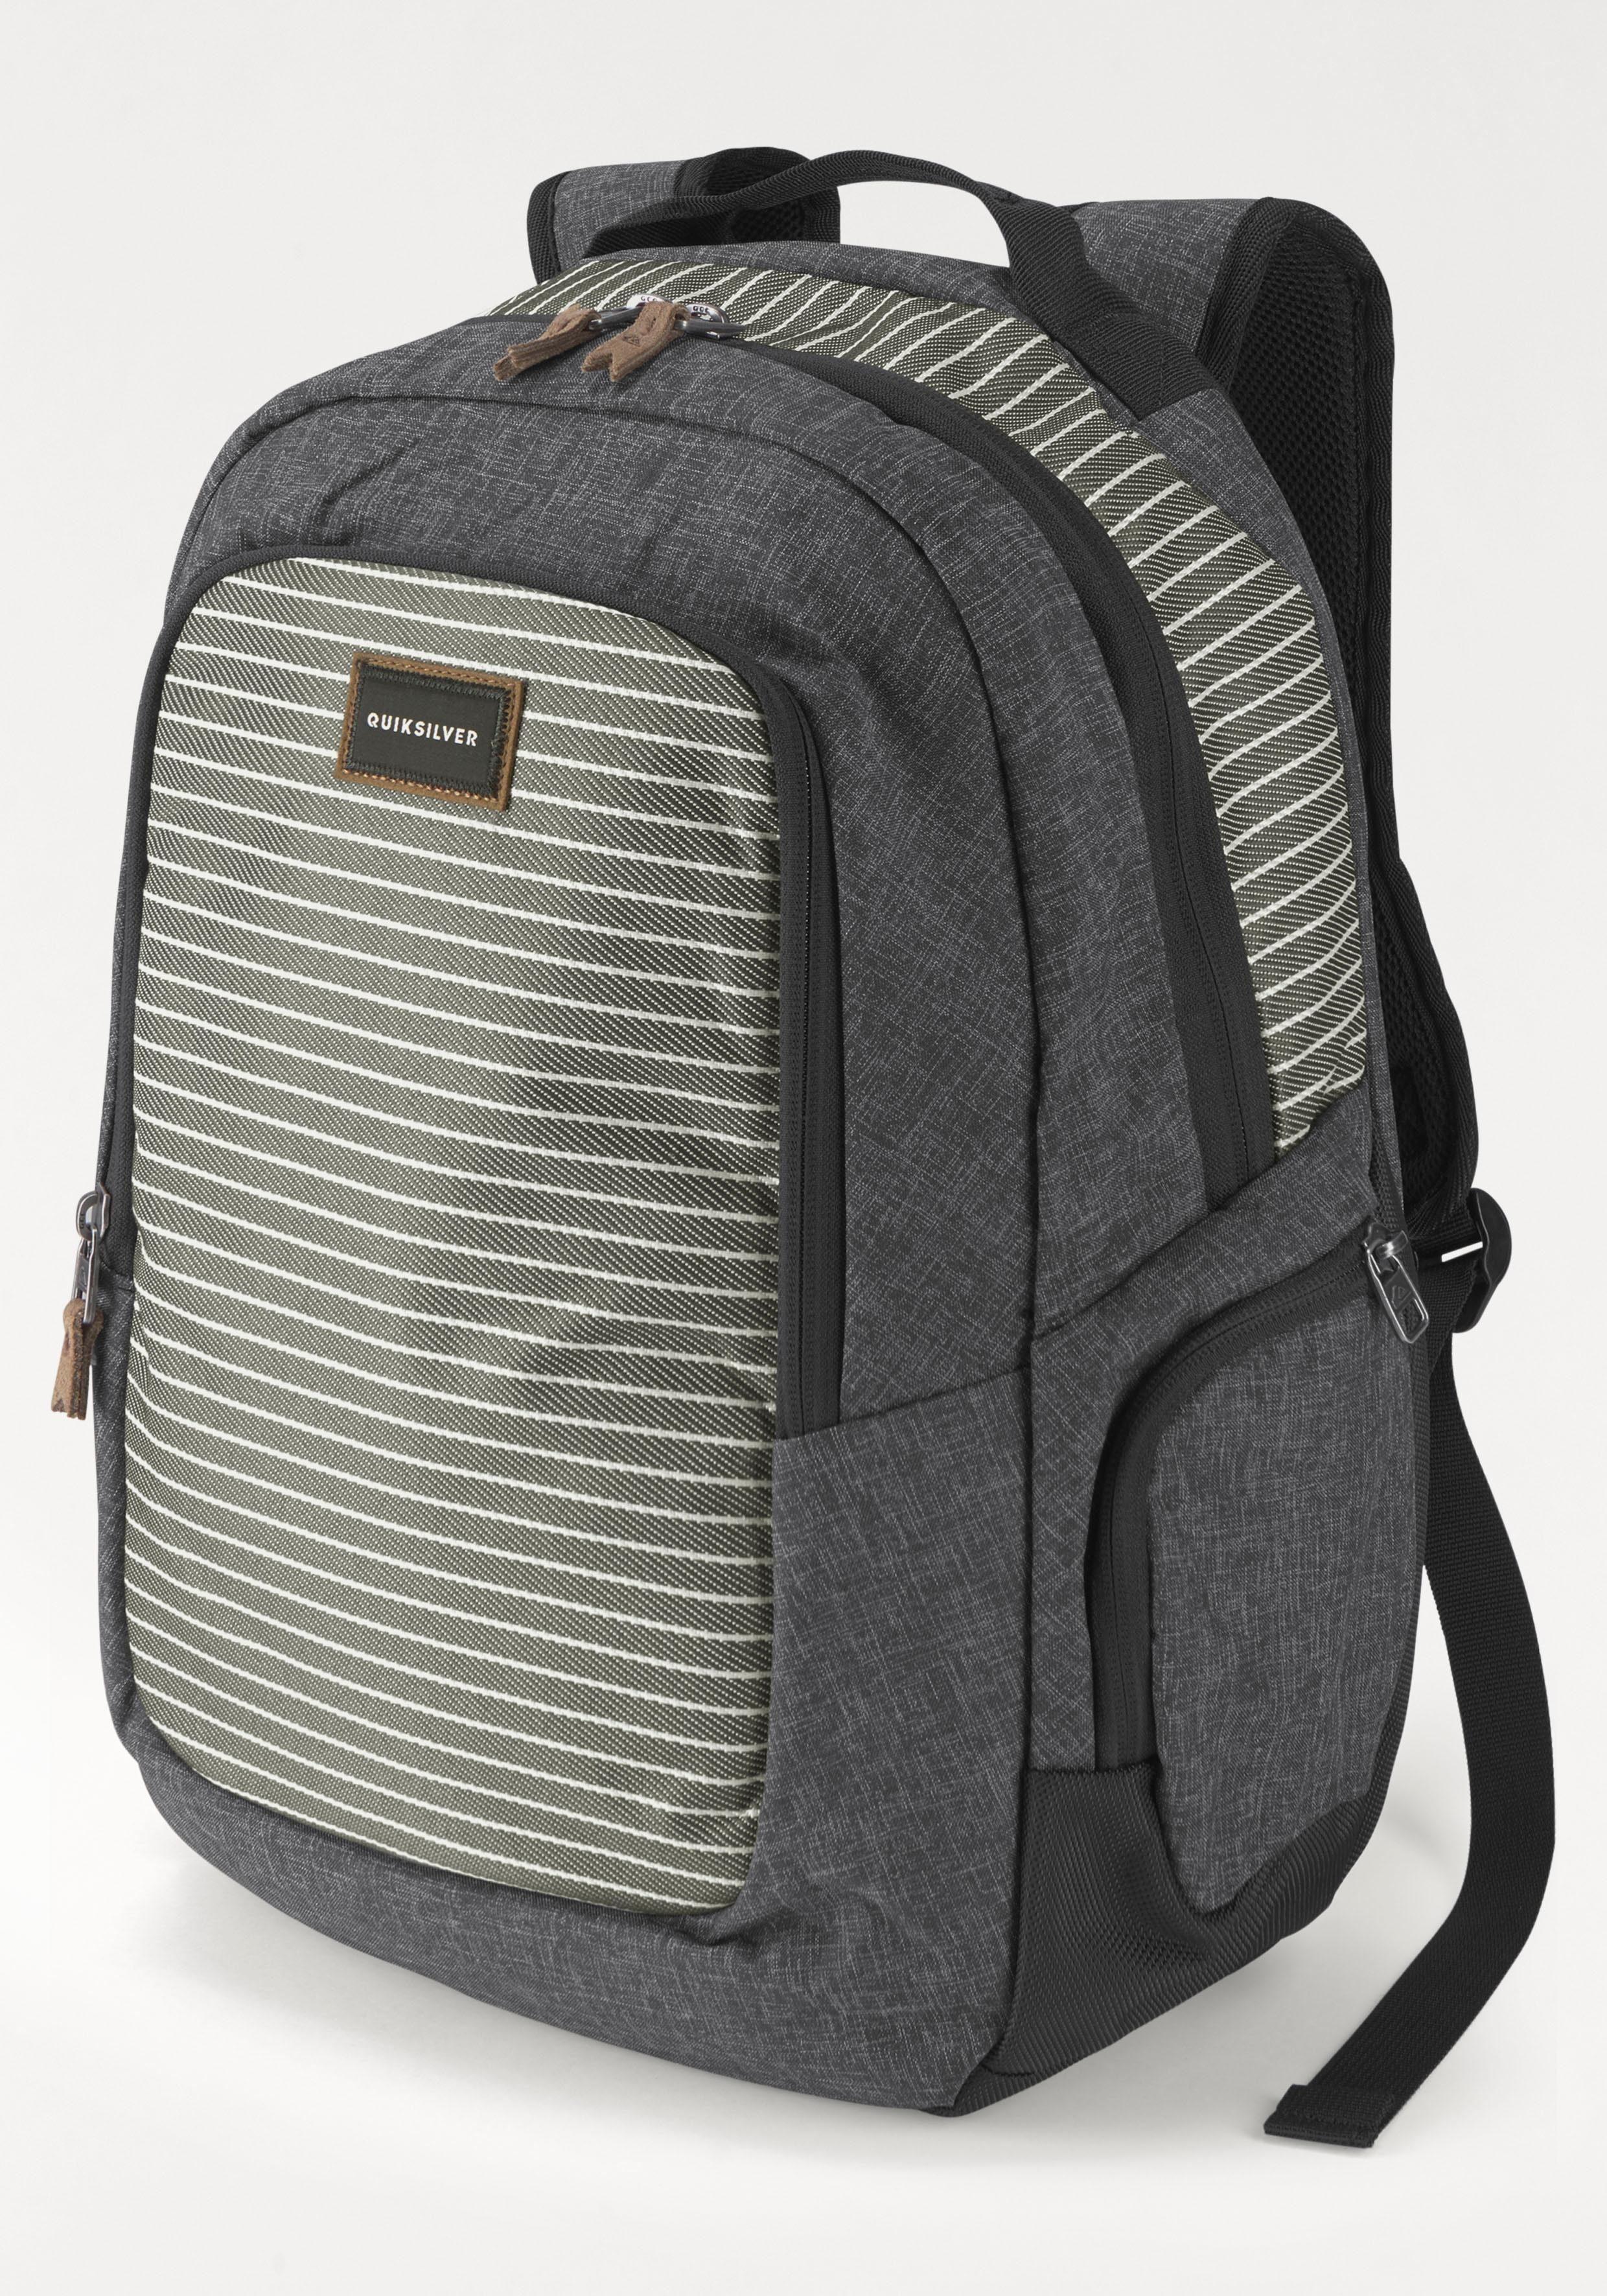 Quiksilver Cityrucksack, Laptop/Tabletfach